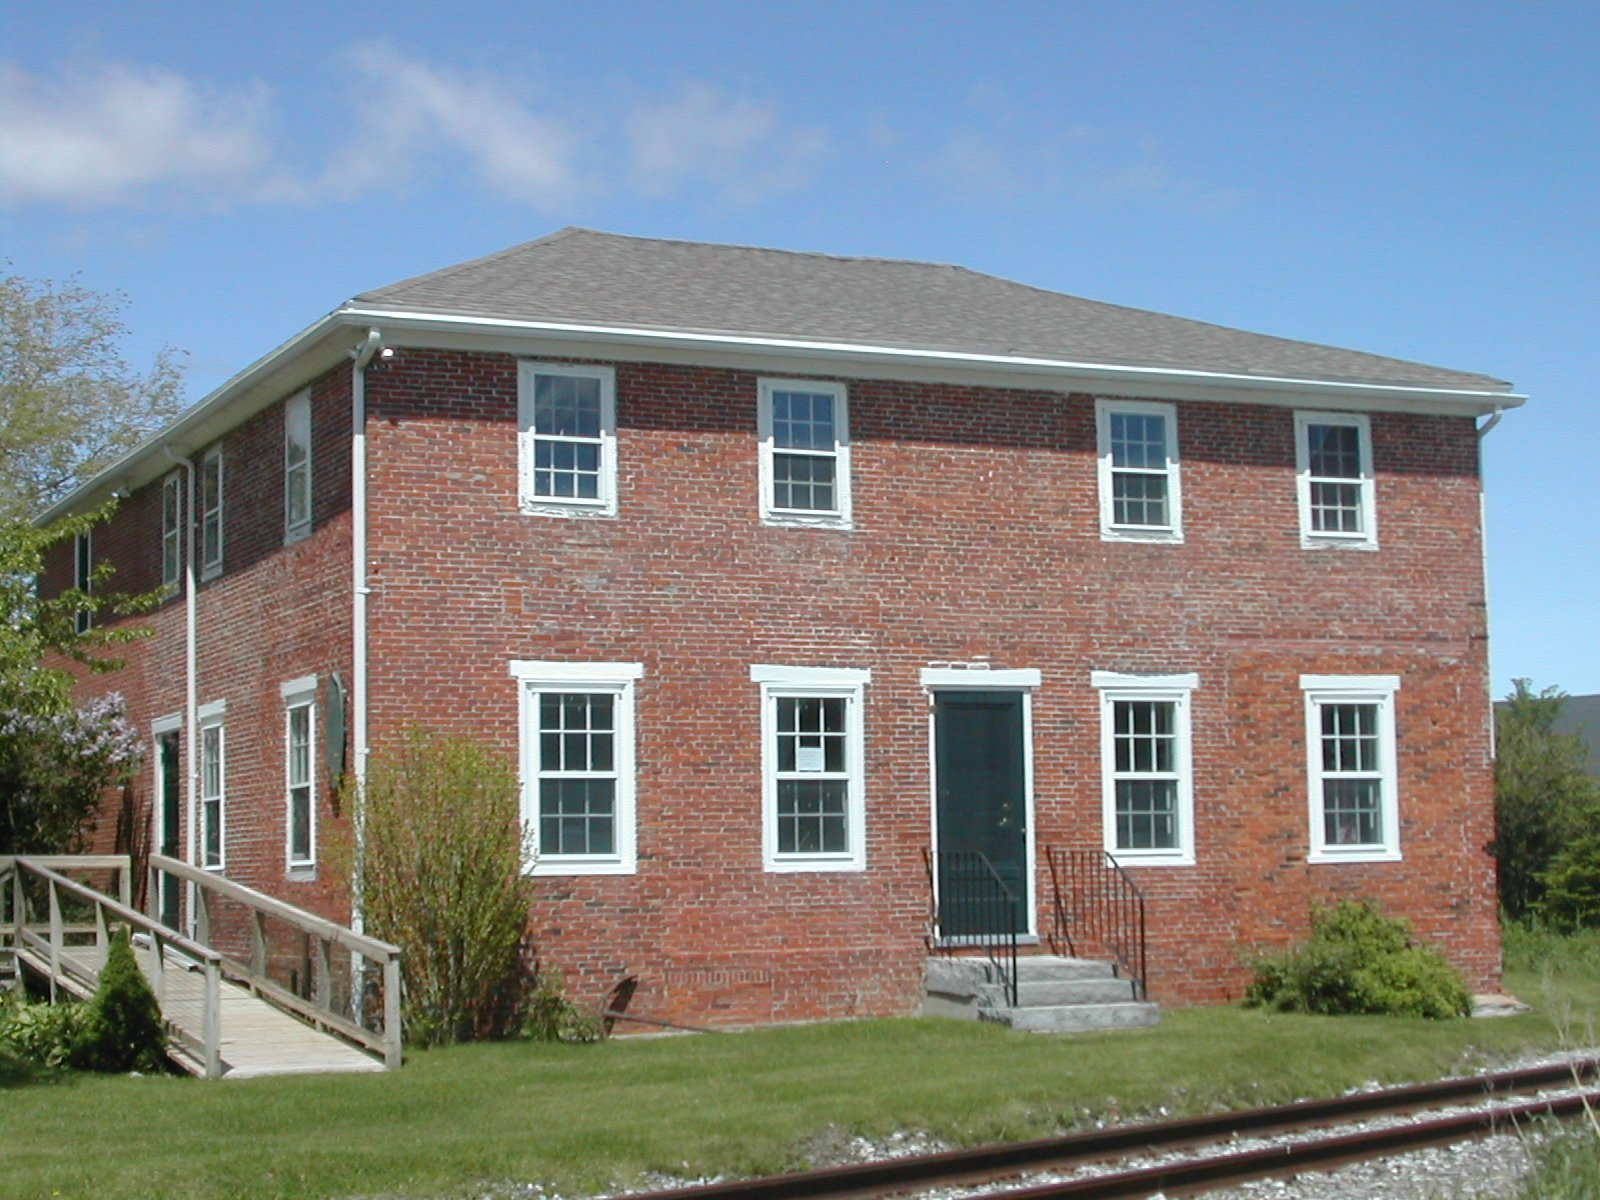 The Thomaston Historical Society